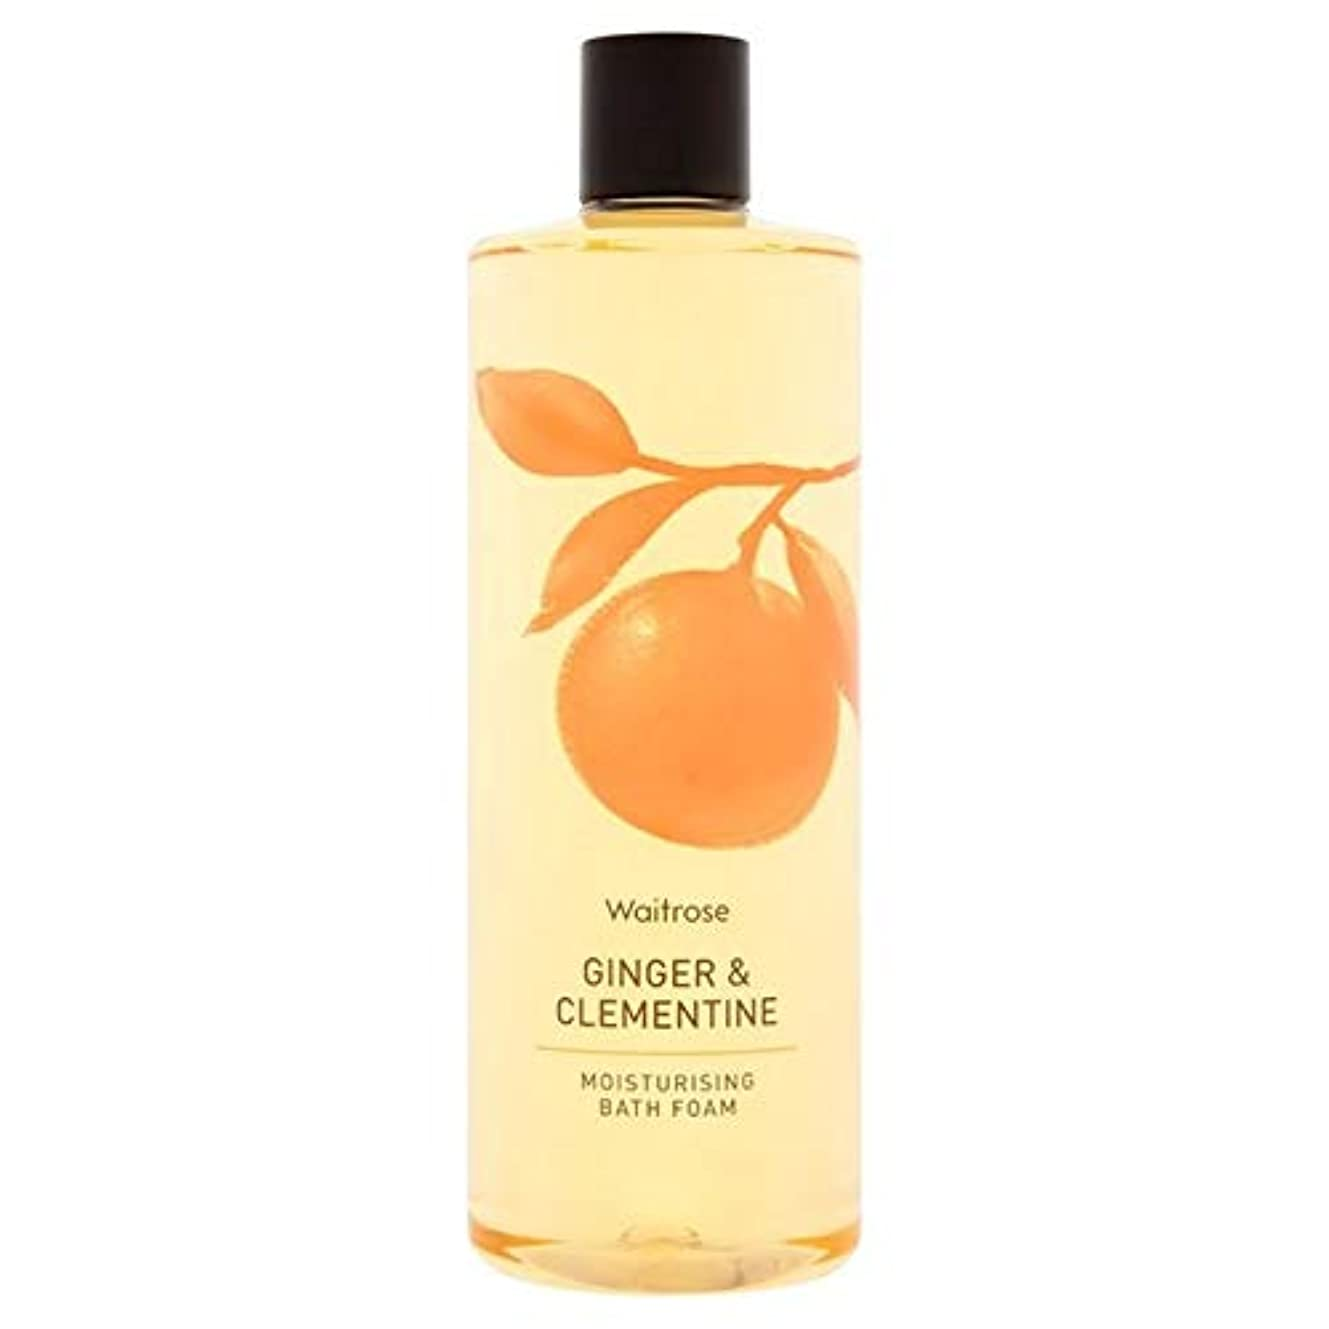 [Waitrose ] ウェイトローズジンジャー&クレメンタイン泡風呂500ミリリットル - Waitrose Ginger & Clementine Foam Bath 500ml [並行輸入品]